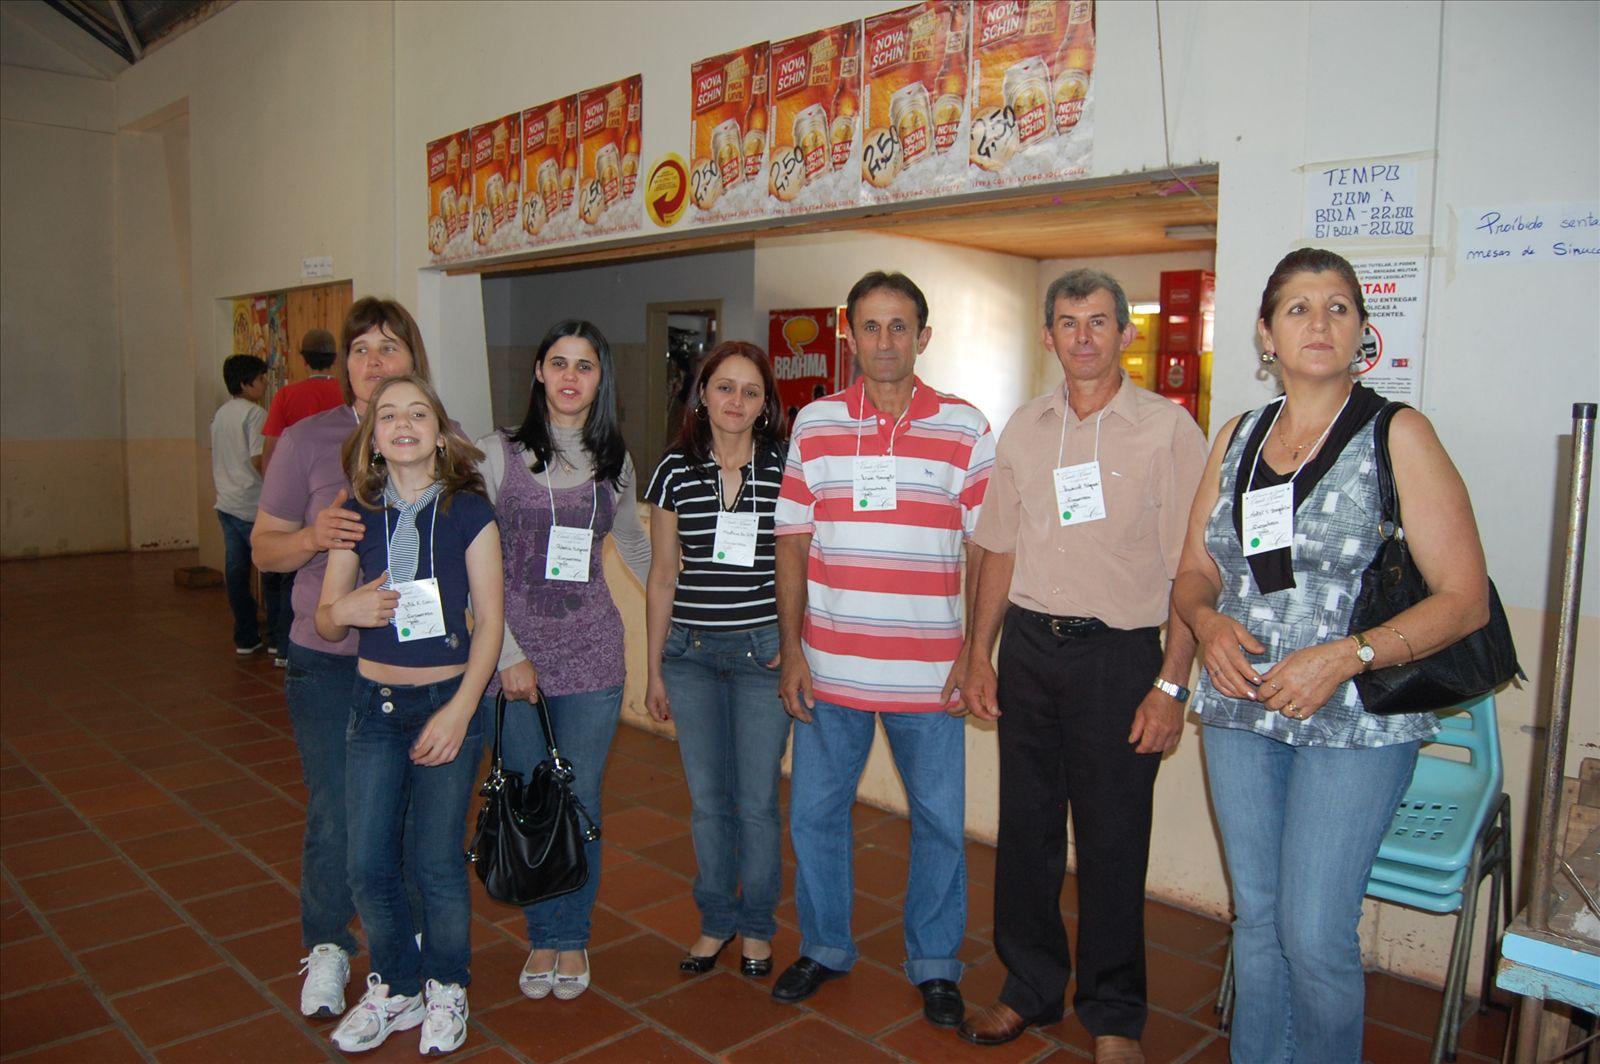 2º Encontro Família Cornelli - 11.10.2009 (37)_0